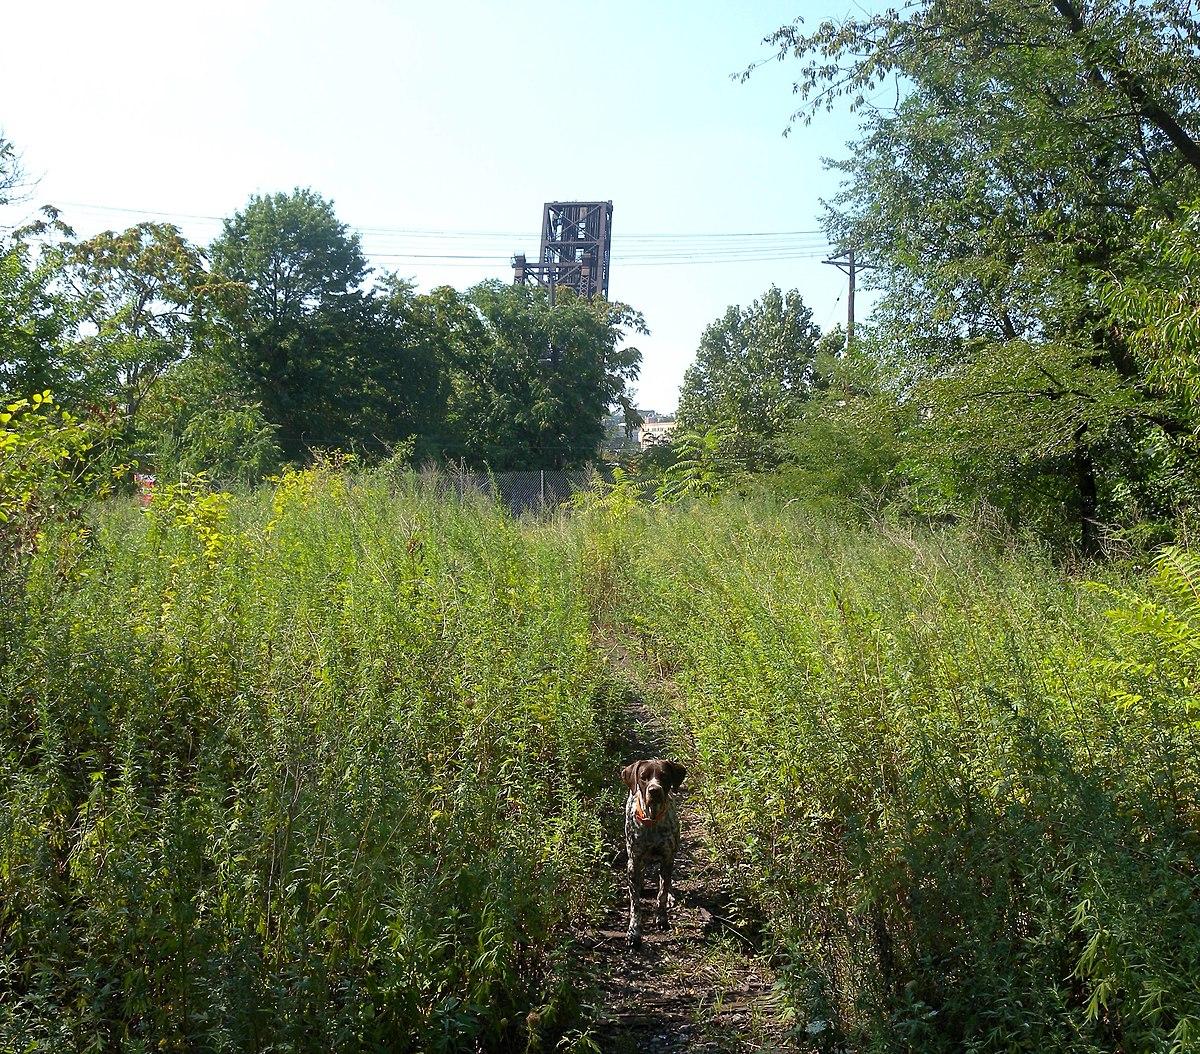 East Newark New Jersey Wikipedia - Us zip code newark